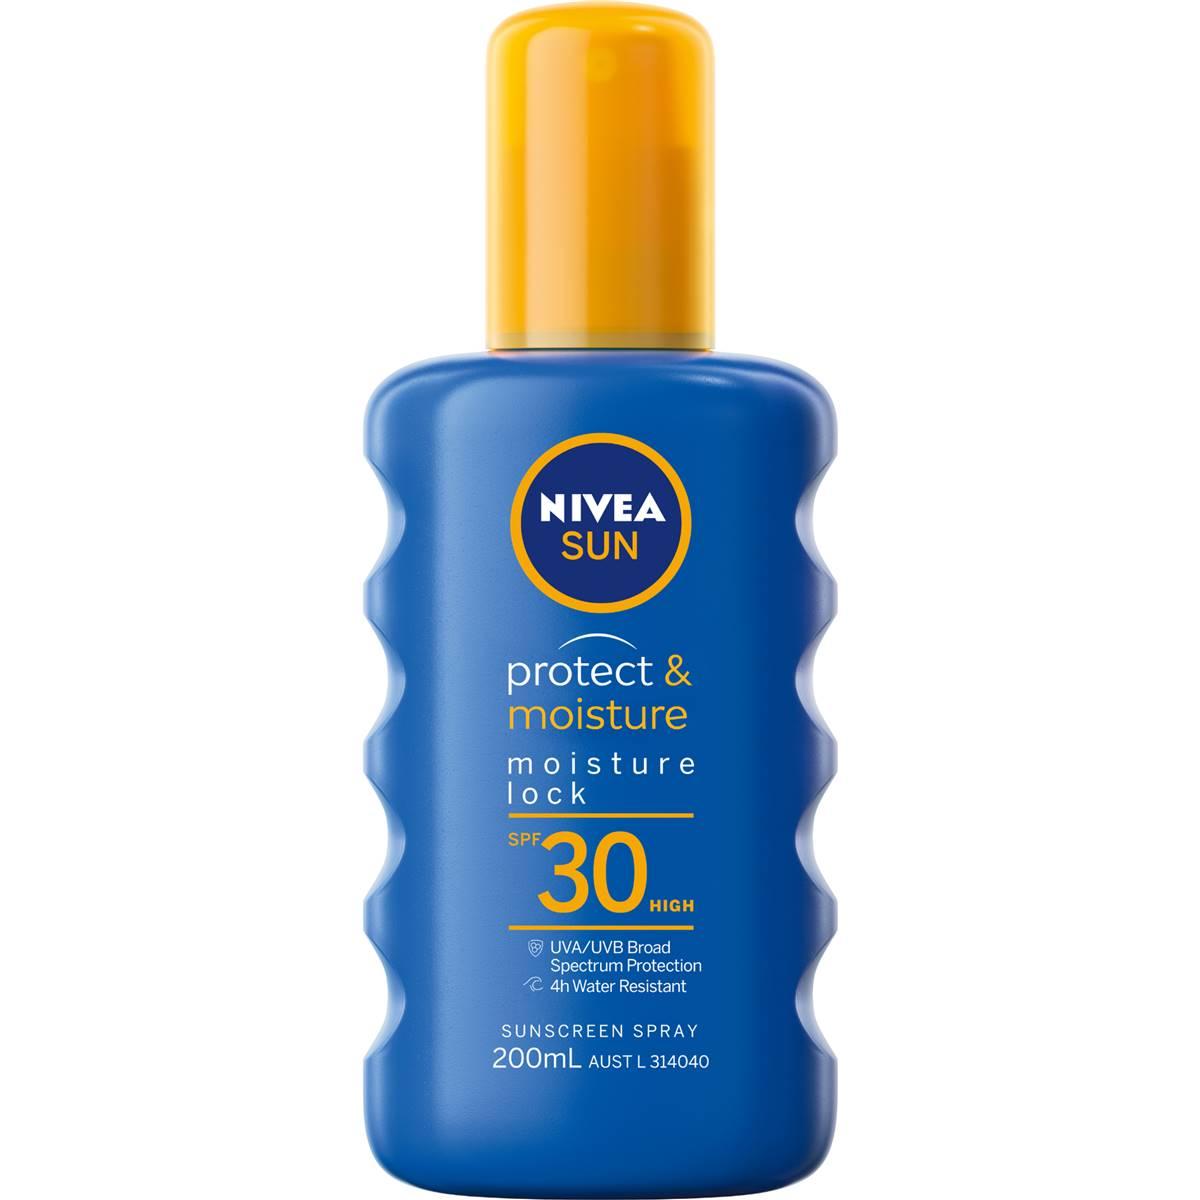 nivea sunscreen spf 30 review